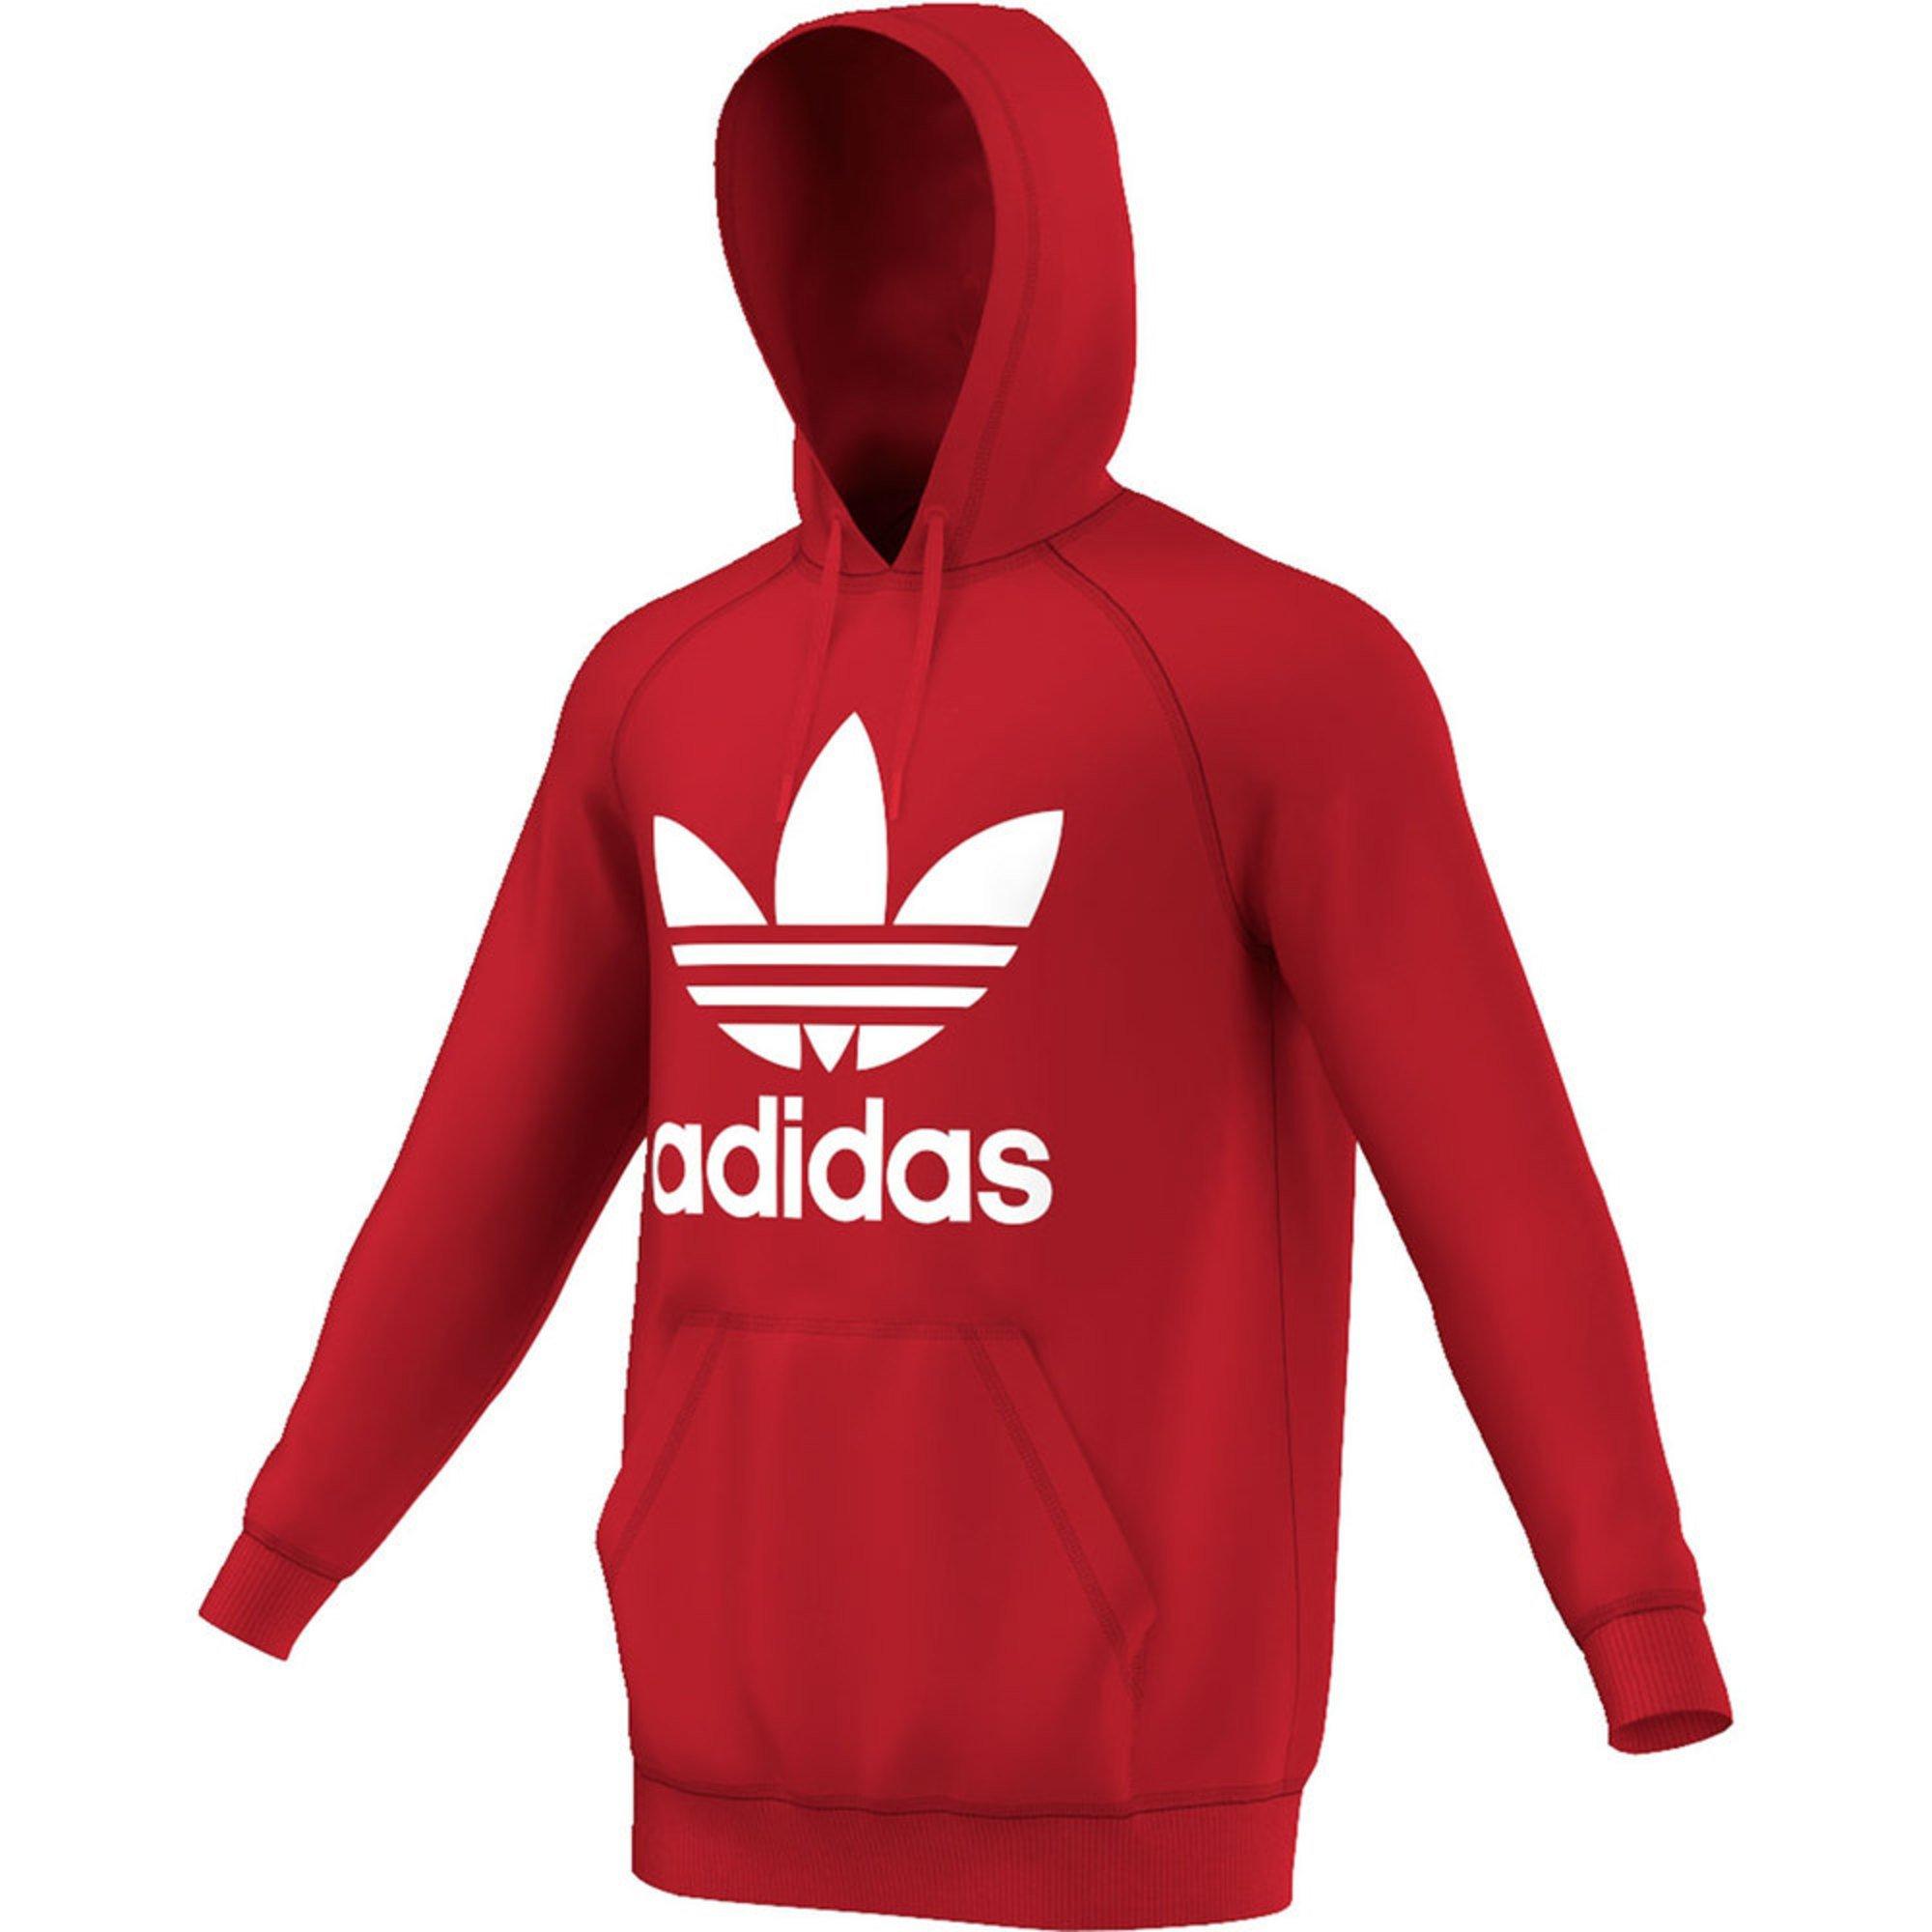 adidas adidas originals 3foil red fleece hood 0 based on 0 reviews. Black Bedroom Furniture Sets. Home Design Ideas